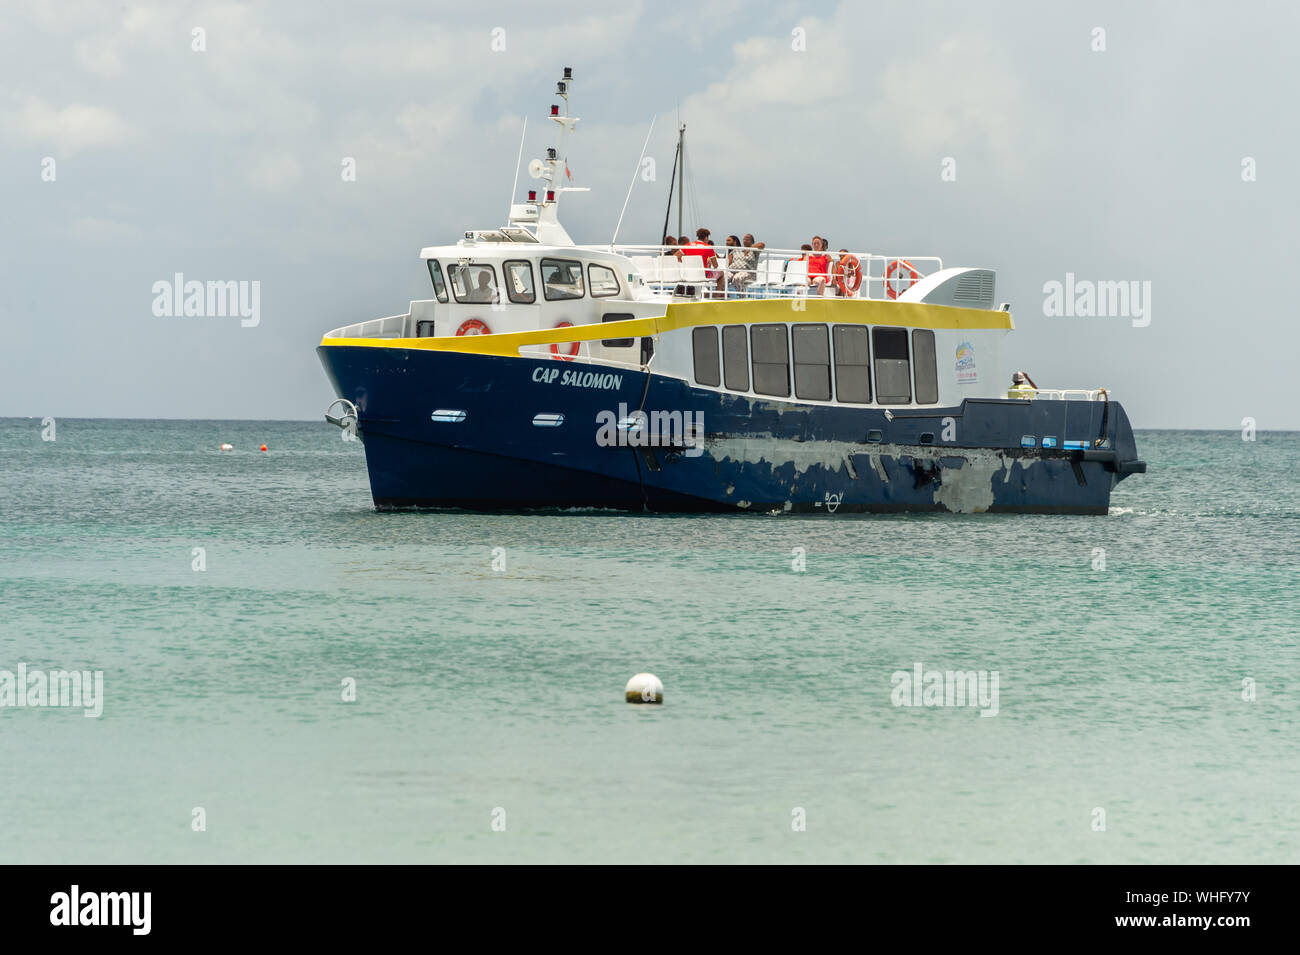 Anse-à-l'Âne, Martinique, France - 22 August 2019: Shuttle boat arriving at Anse-à-l'Âne. Stock Photo